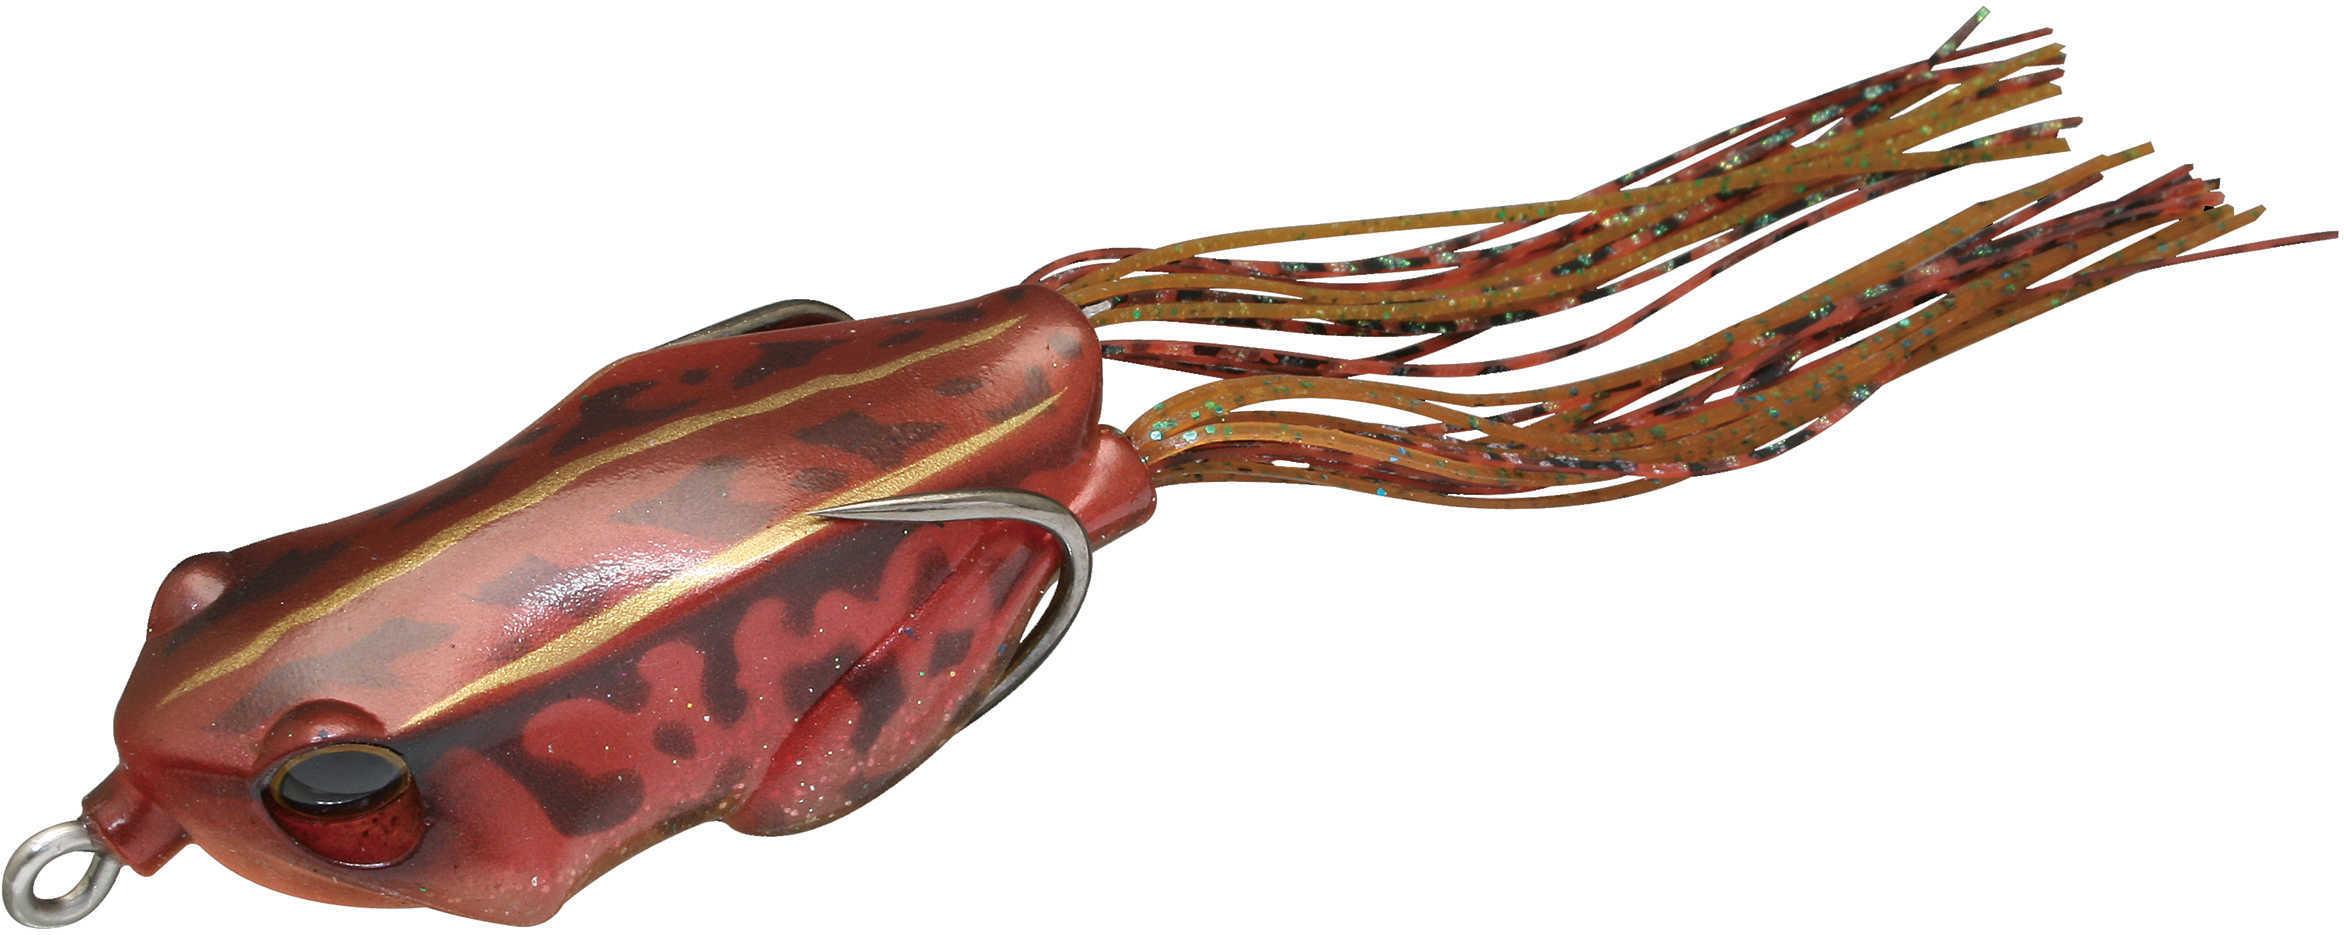 "Jackall Lures Kaera Hard Bait Lure 2.20"" Body Length, 5 oz, Red Frog, Per 1 Md: JKAERA-RF"